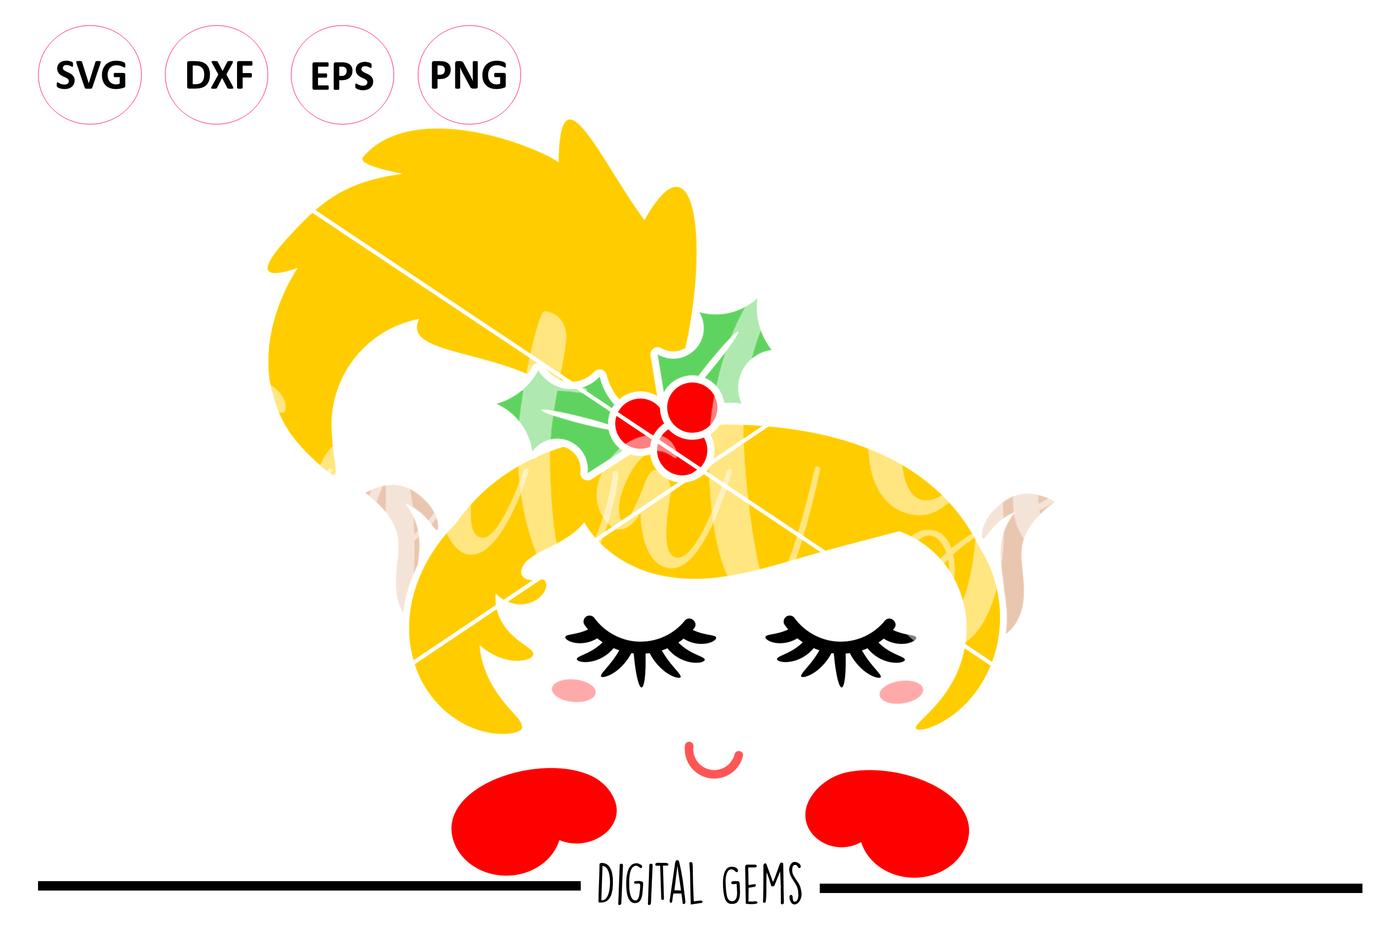 Elf Svg Dxf Eps Png Files By Digital Gems Thehungryjpeg Com